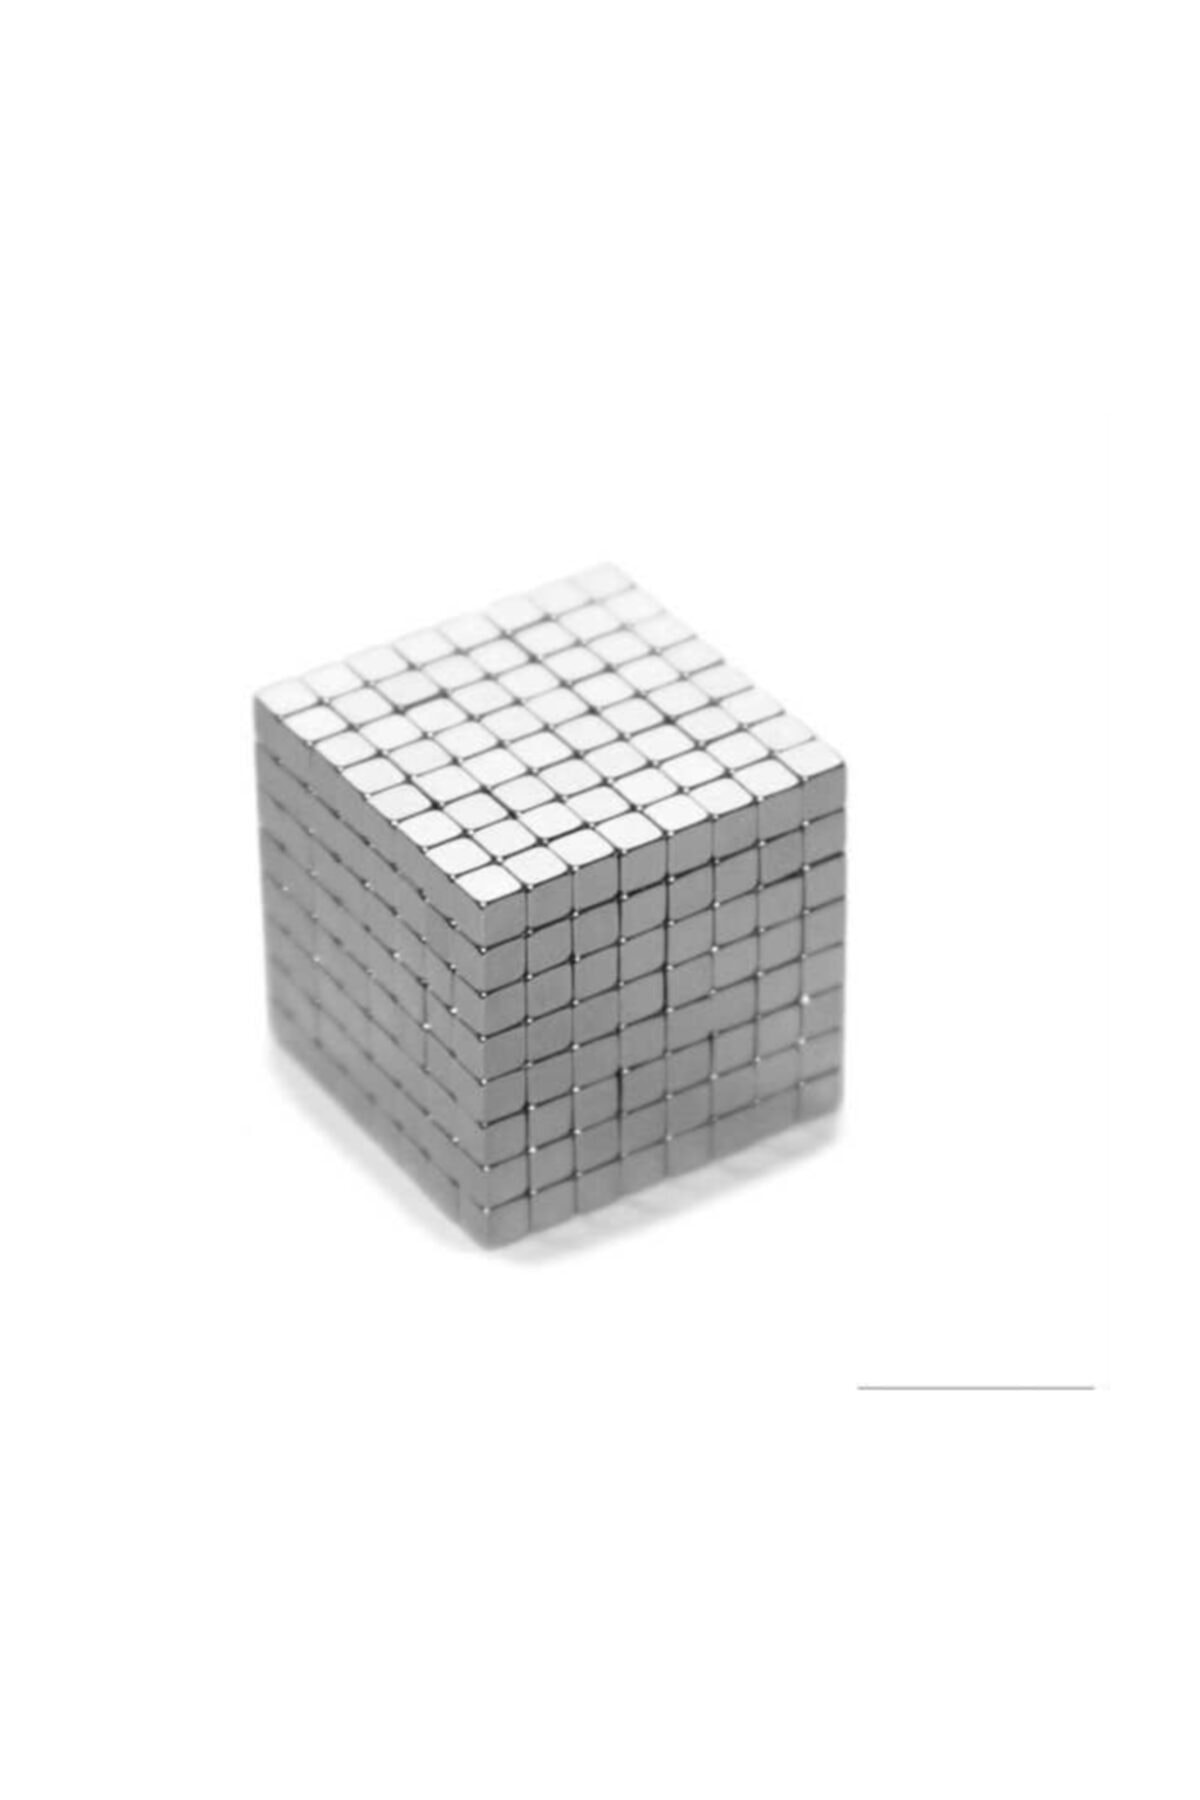 Dünya Magnet 100 Adet 3mm X 3mm X 3mm Küp Neodyum Mıknatıs(100'lü Paket) 1